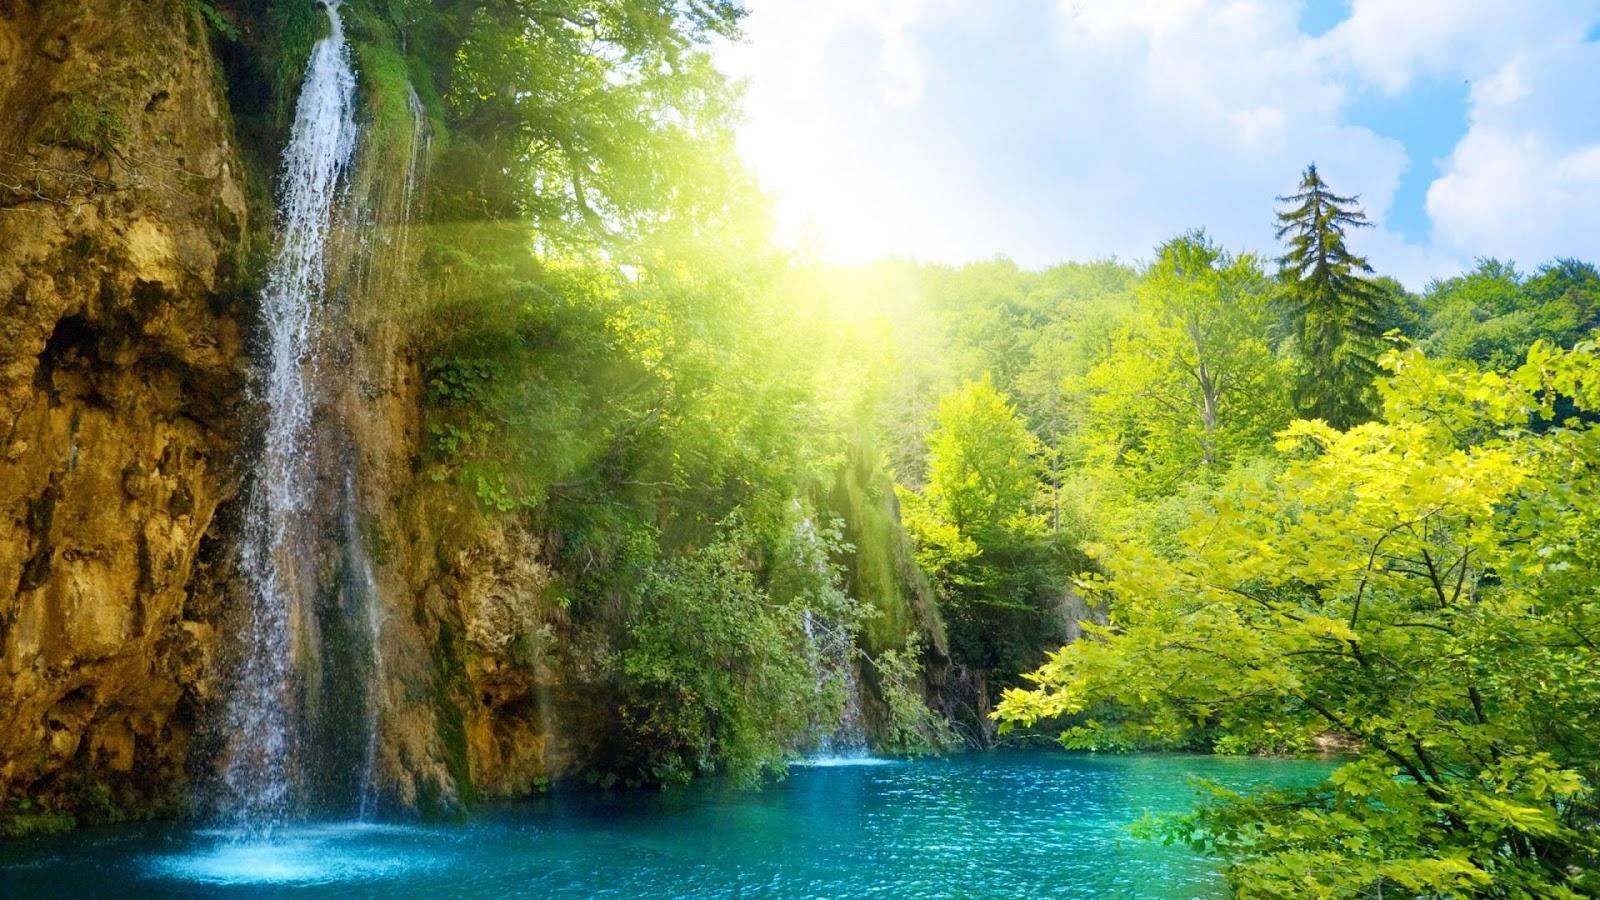 nature hd waterfall wallpaper